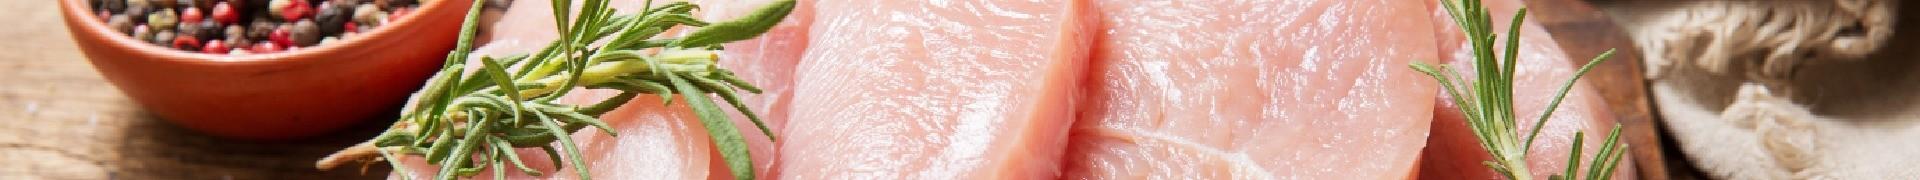 Curcan congelat / fresh